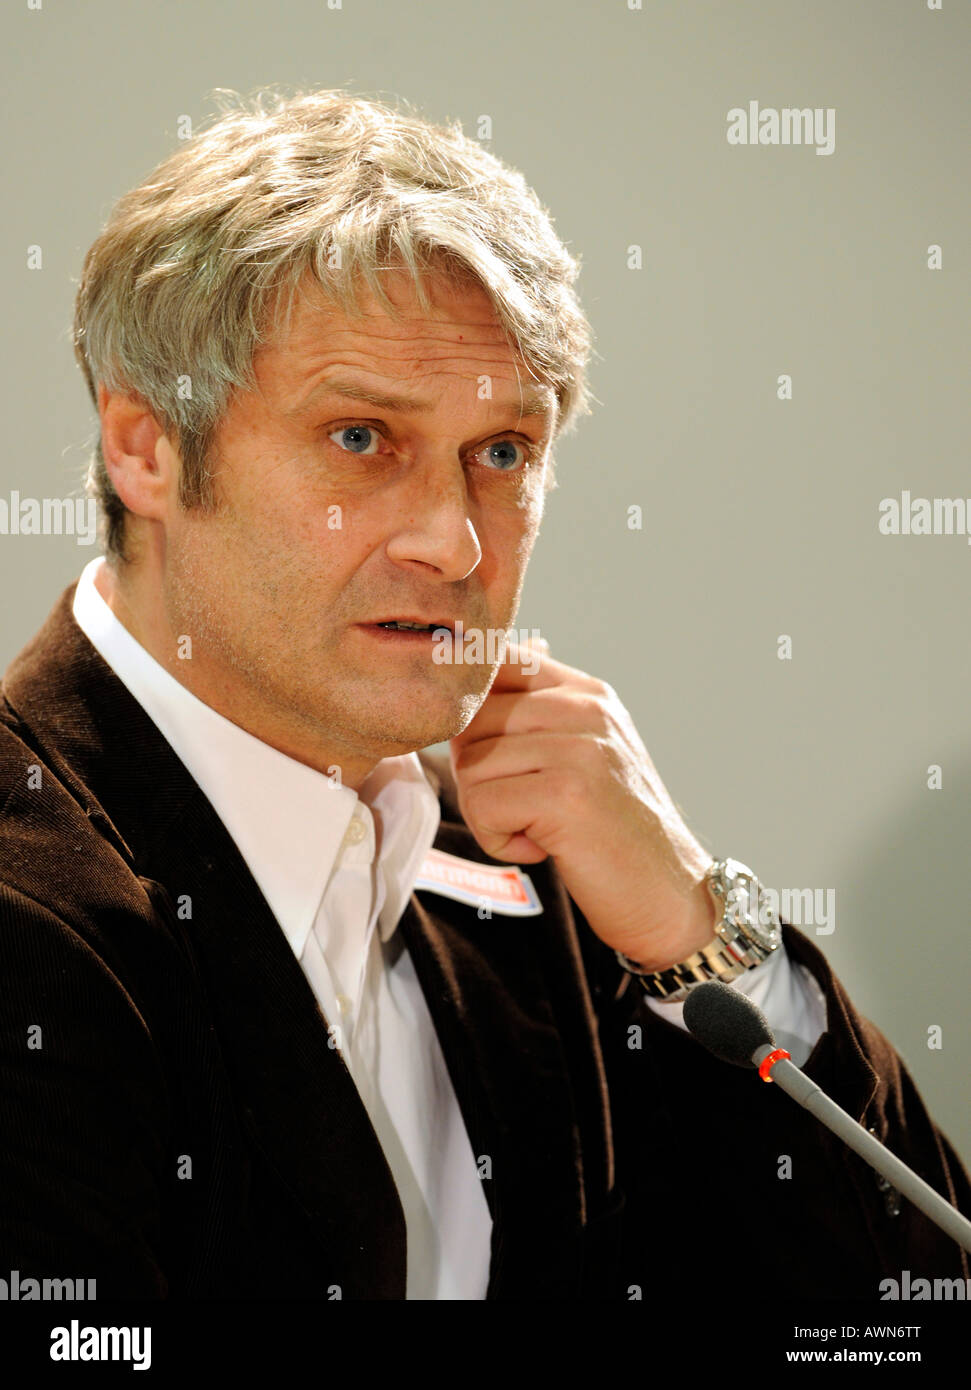 Armin VEH coach VfB Stuttgart - Stock Image